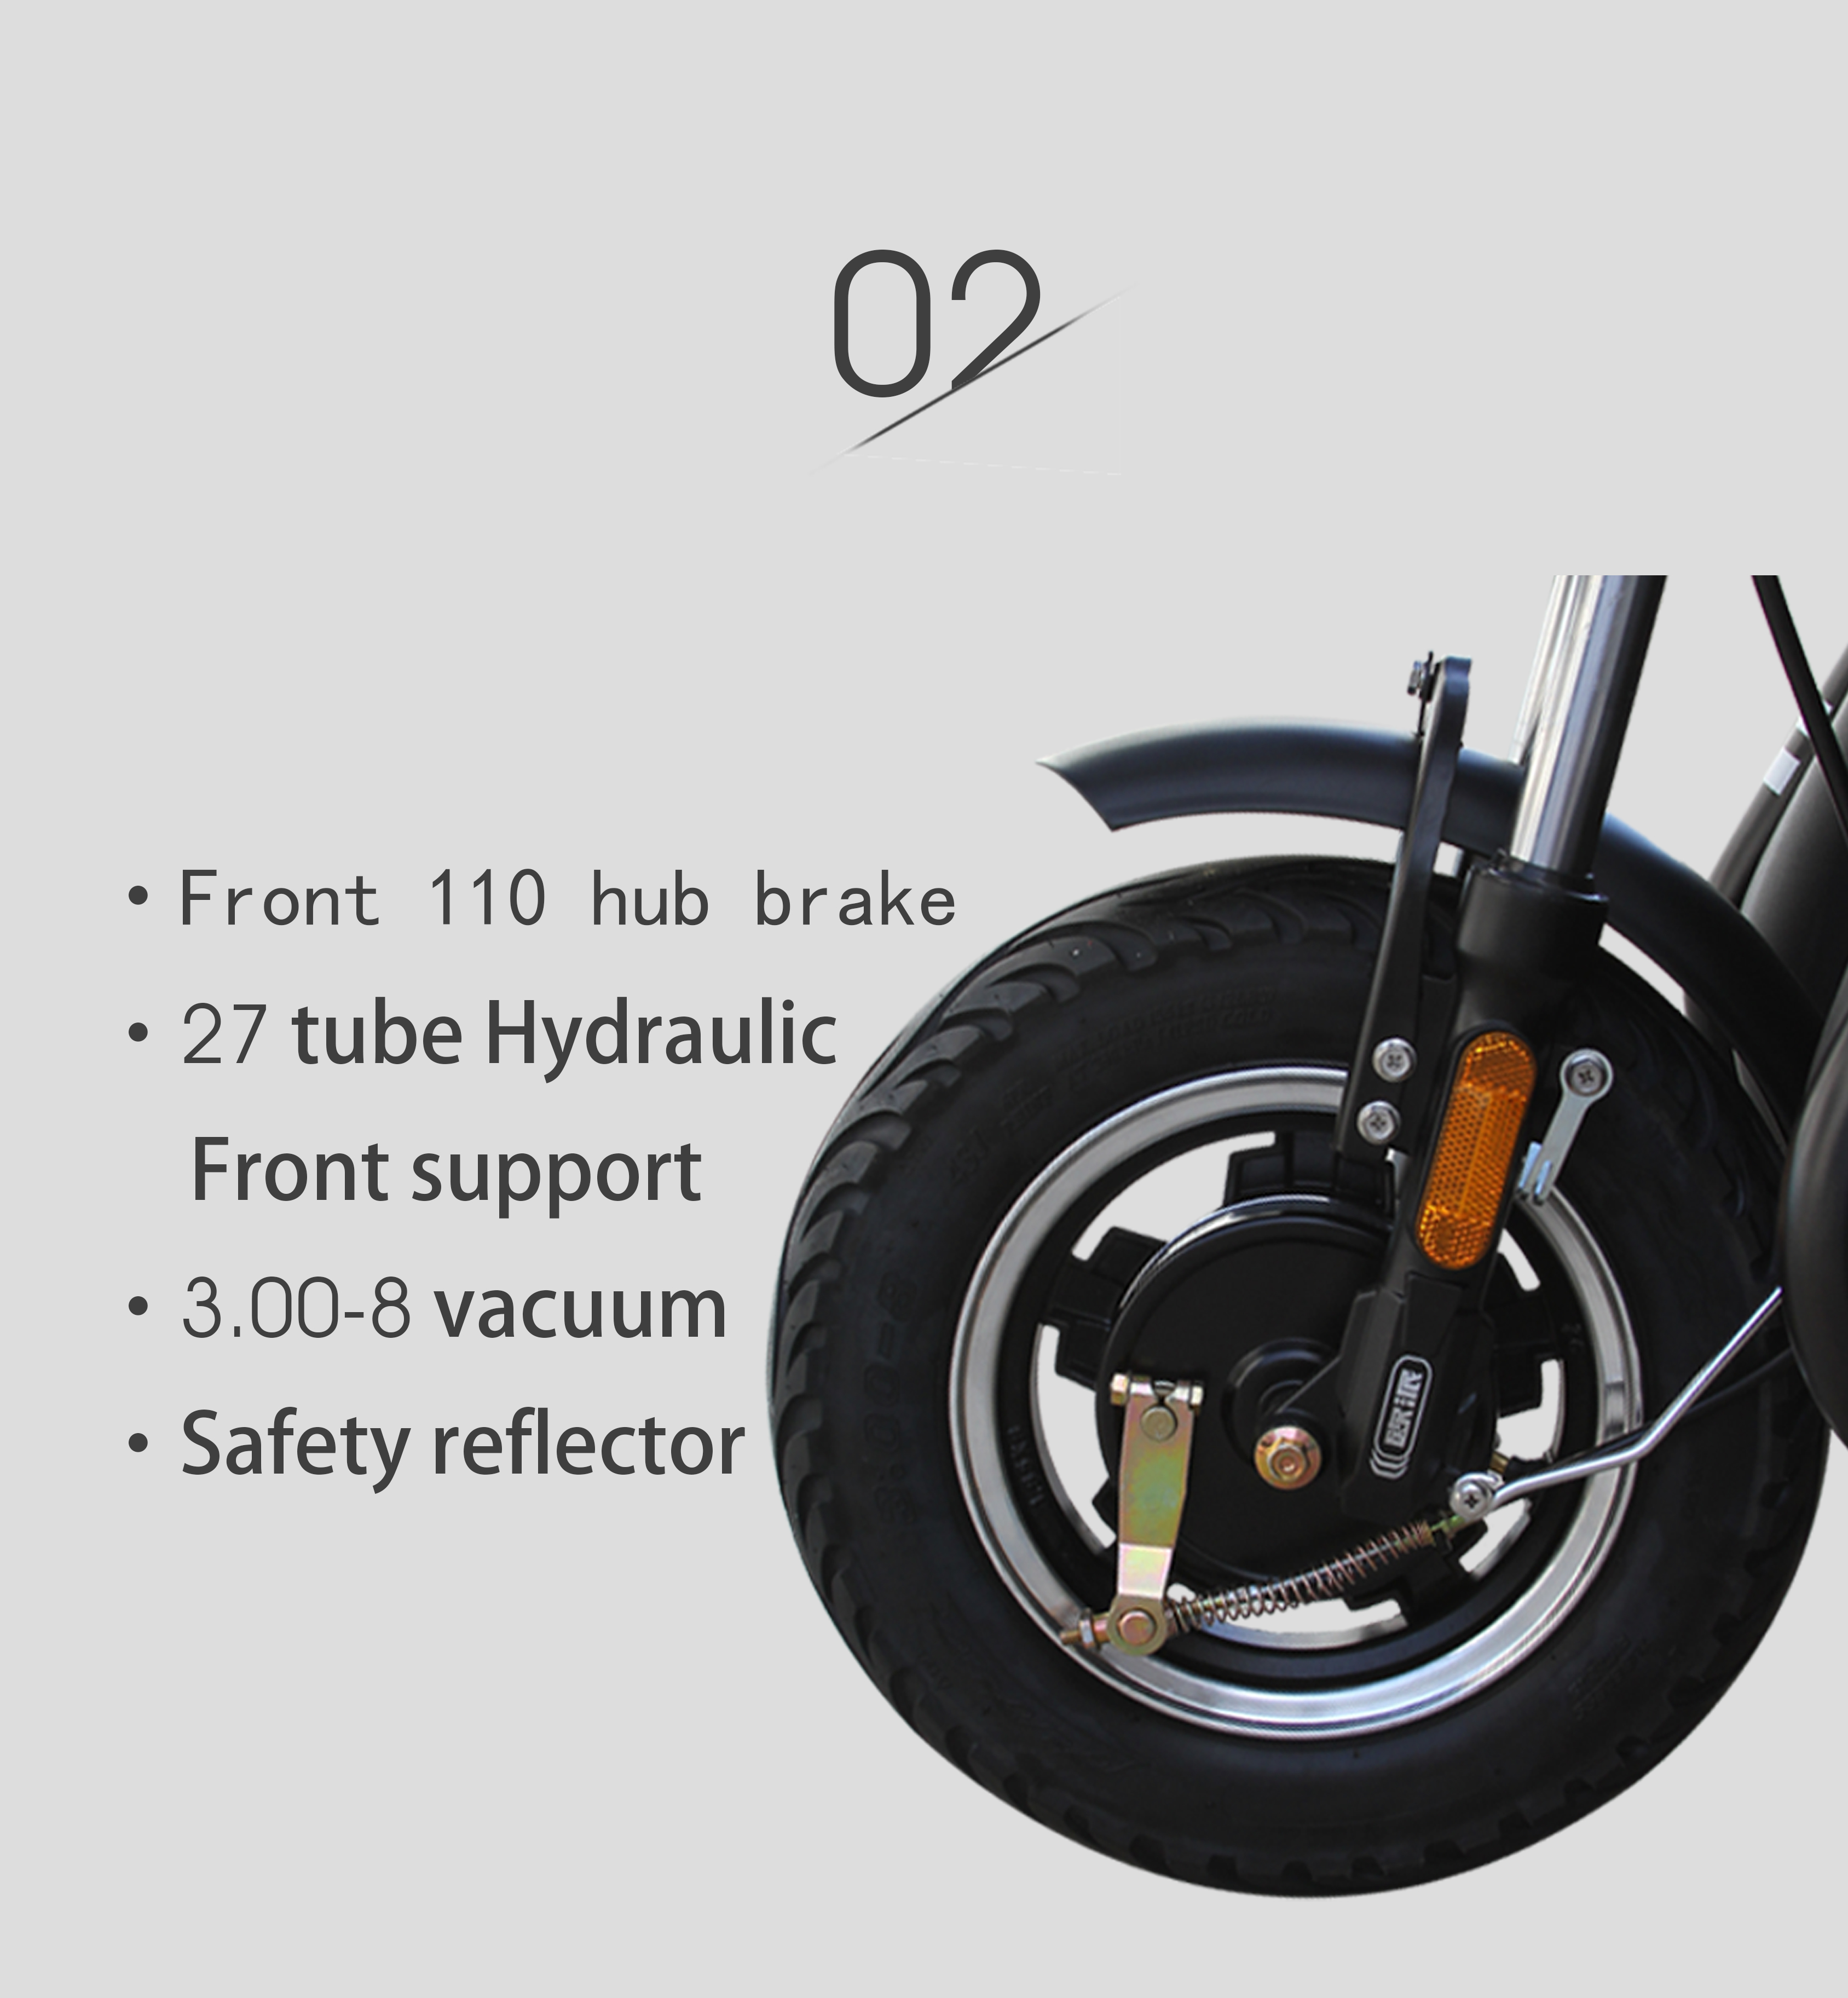 passenger drift trike china 3 wheel motor tricycle passenge working folding electric scooter